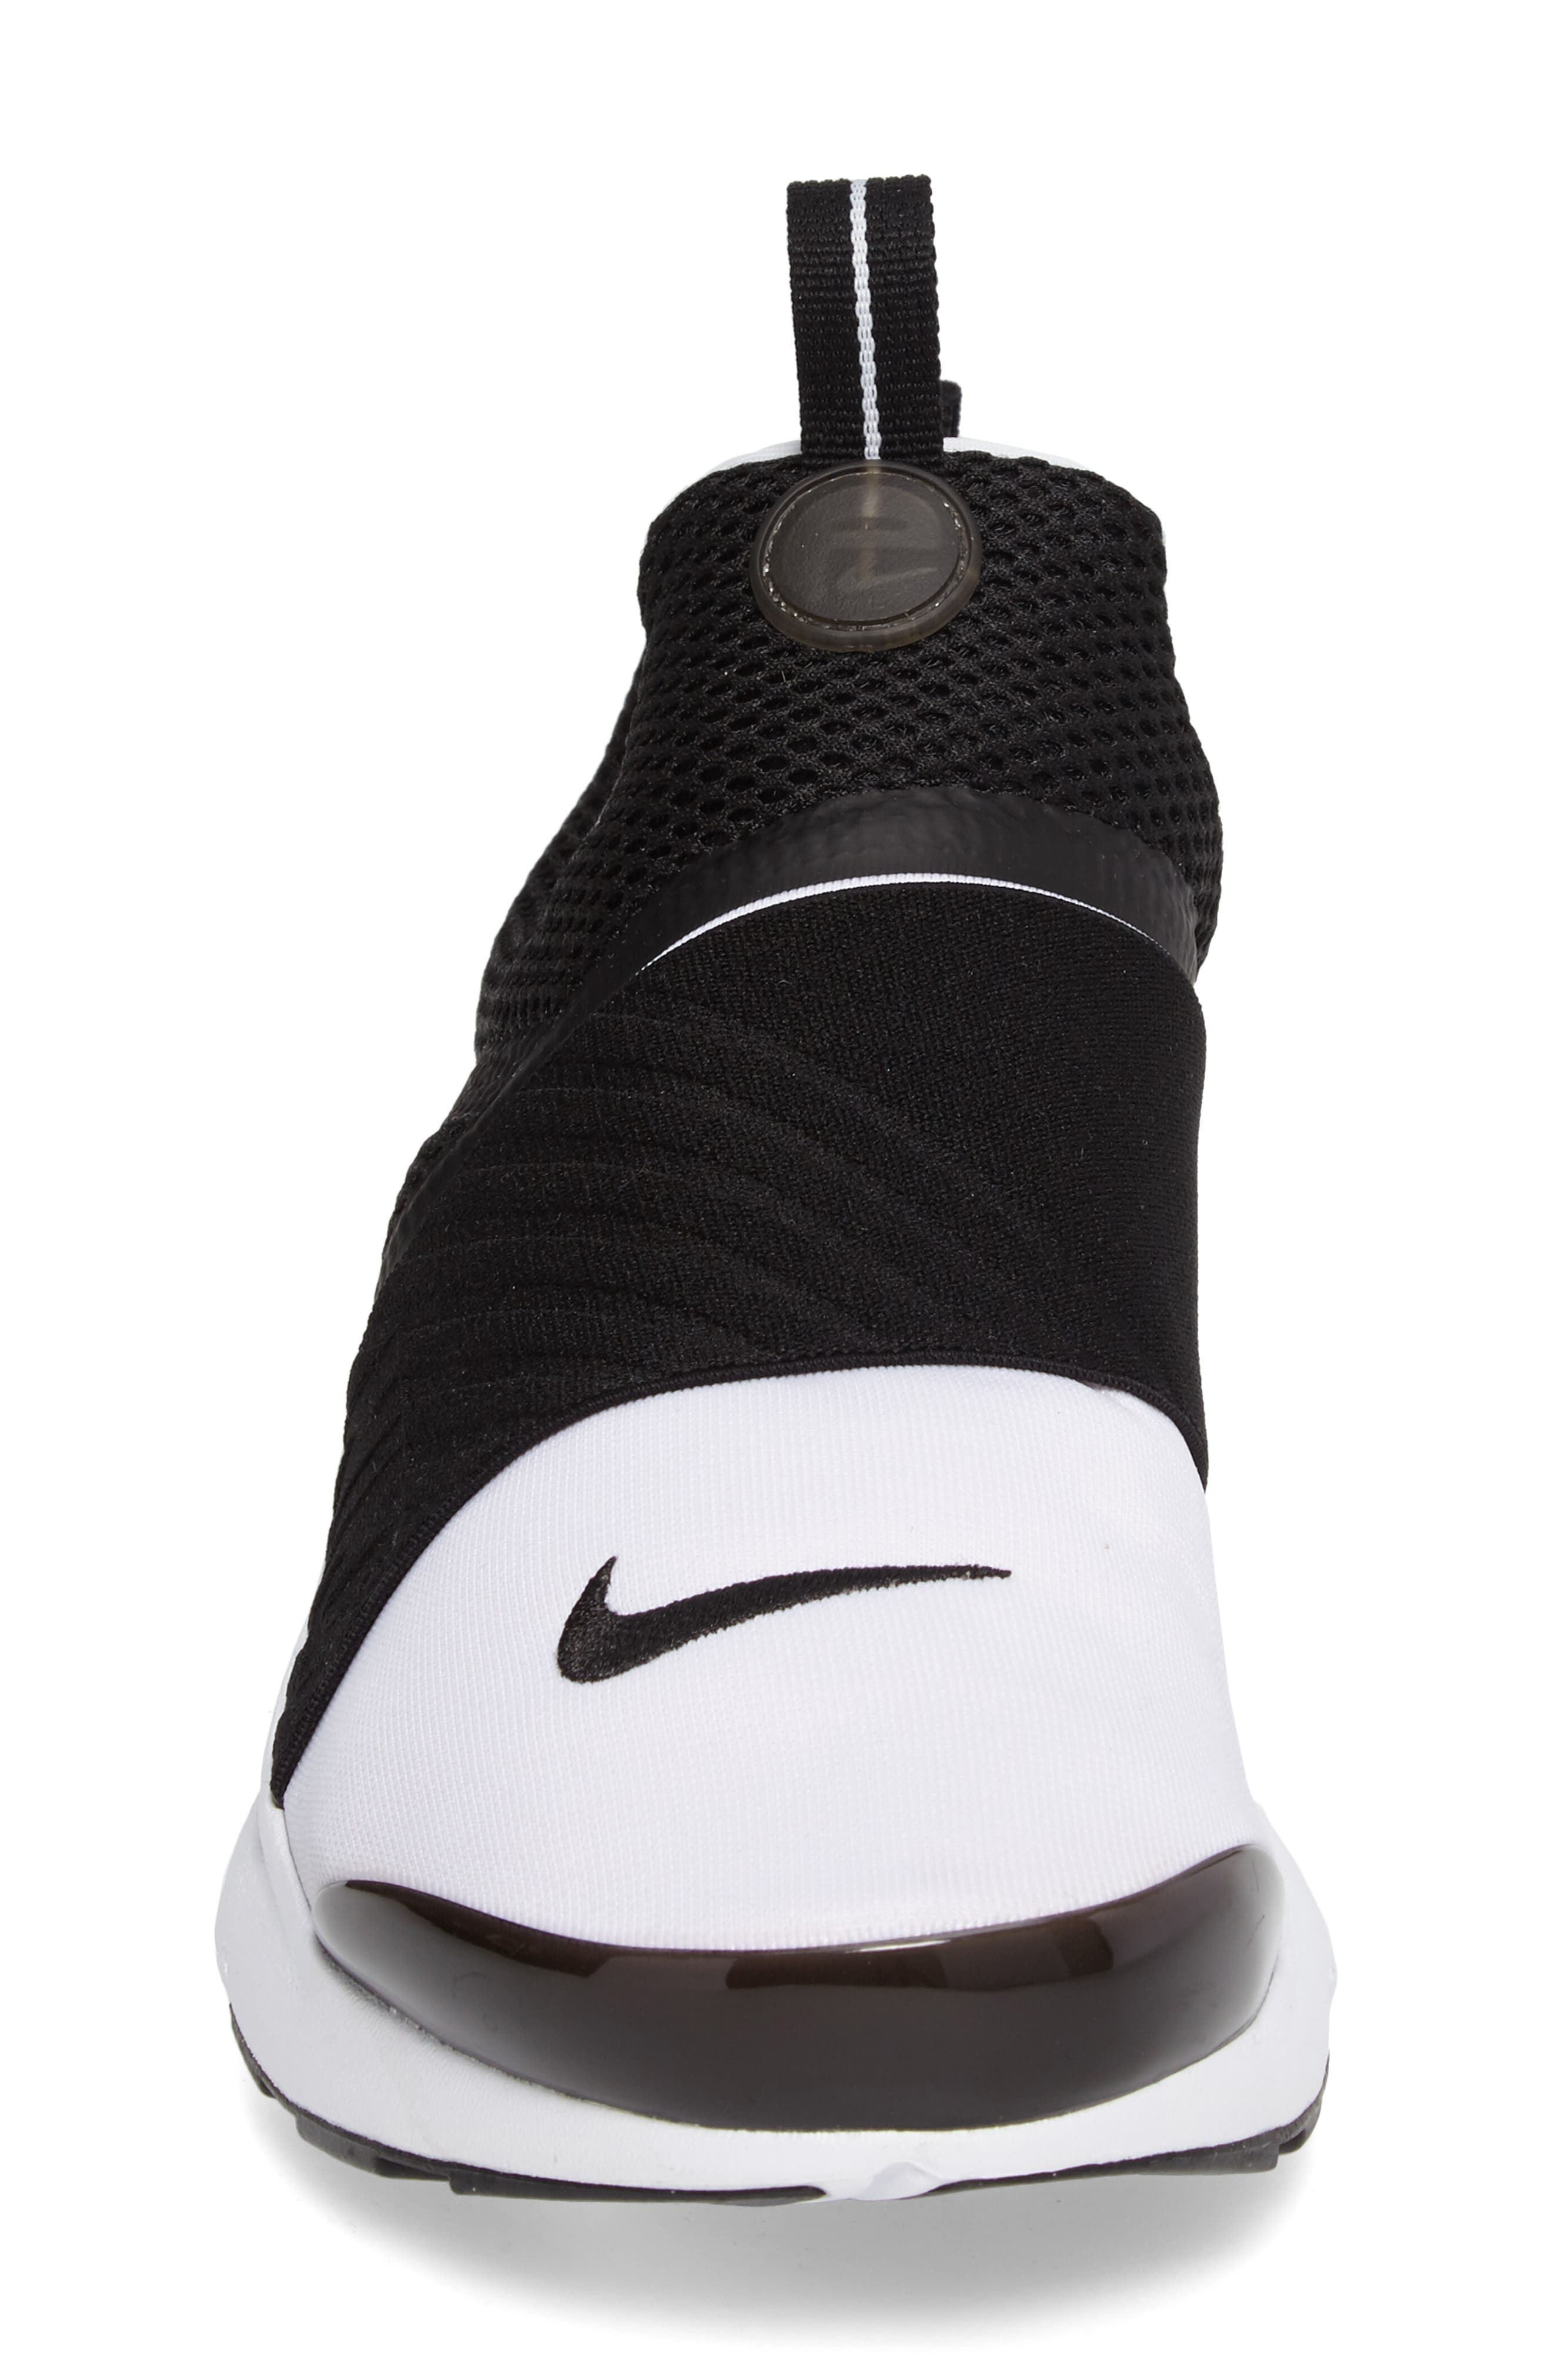 Alternate Image 4  - Nike Presto Extreme Sneaker (Walker, Toddler, Little Kid & Big Kid)